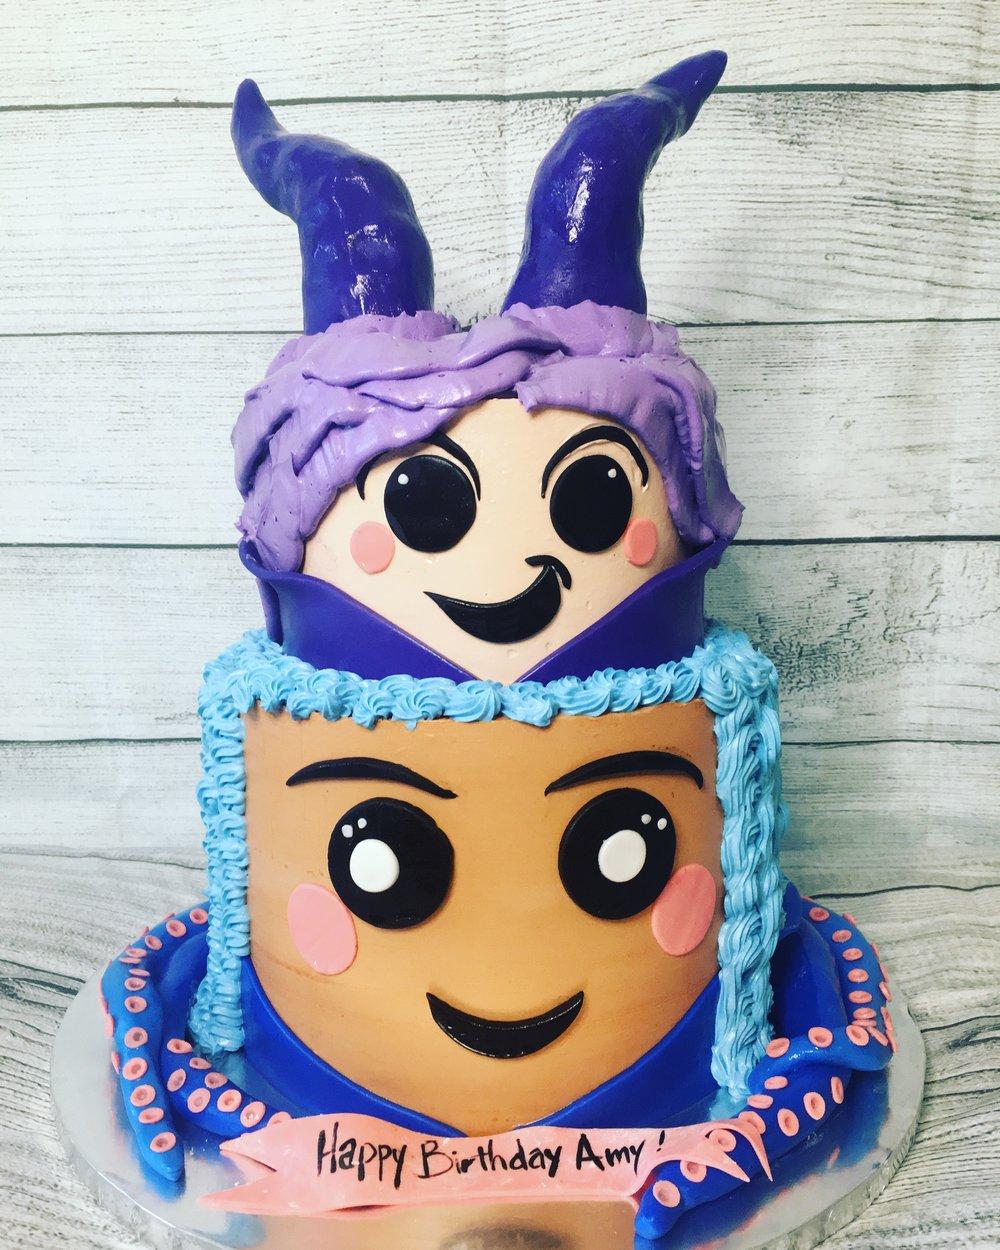 Disney Descendants 3 Cake - MWOKAJI CAKERY.JPG